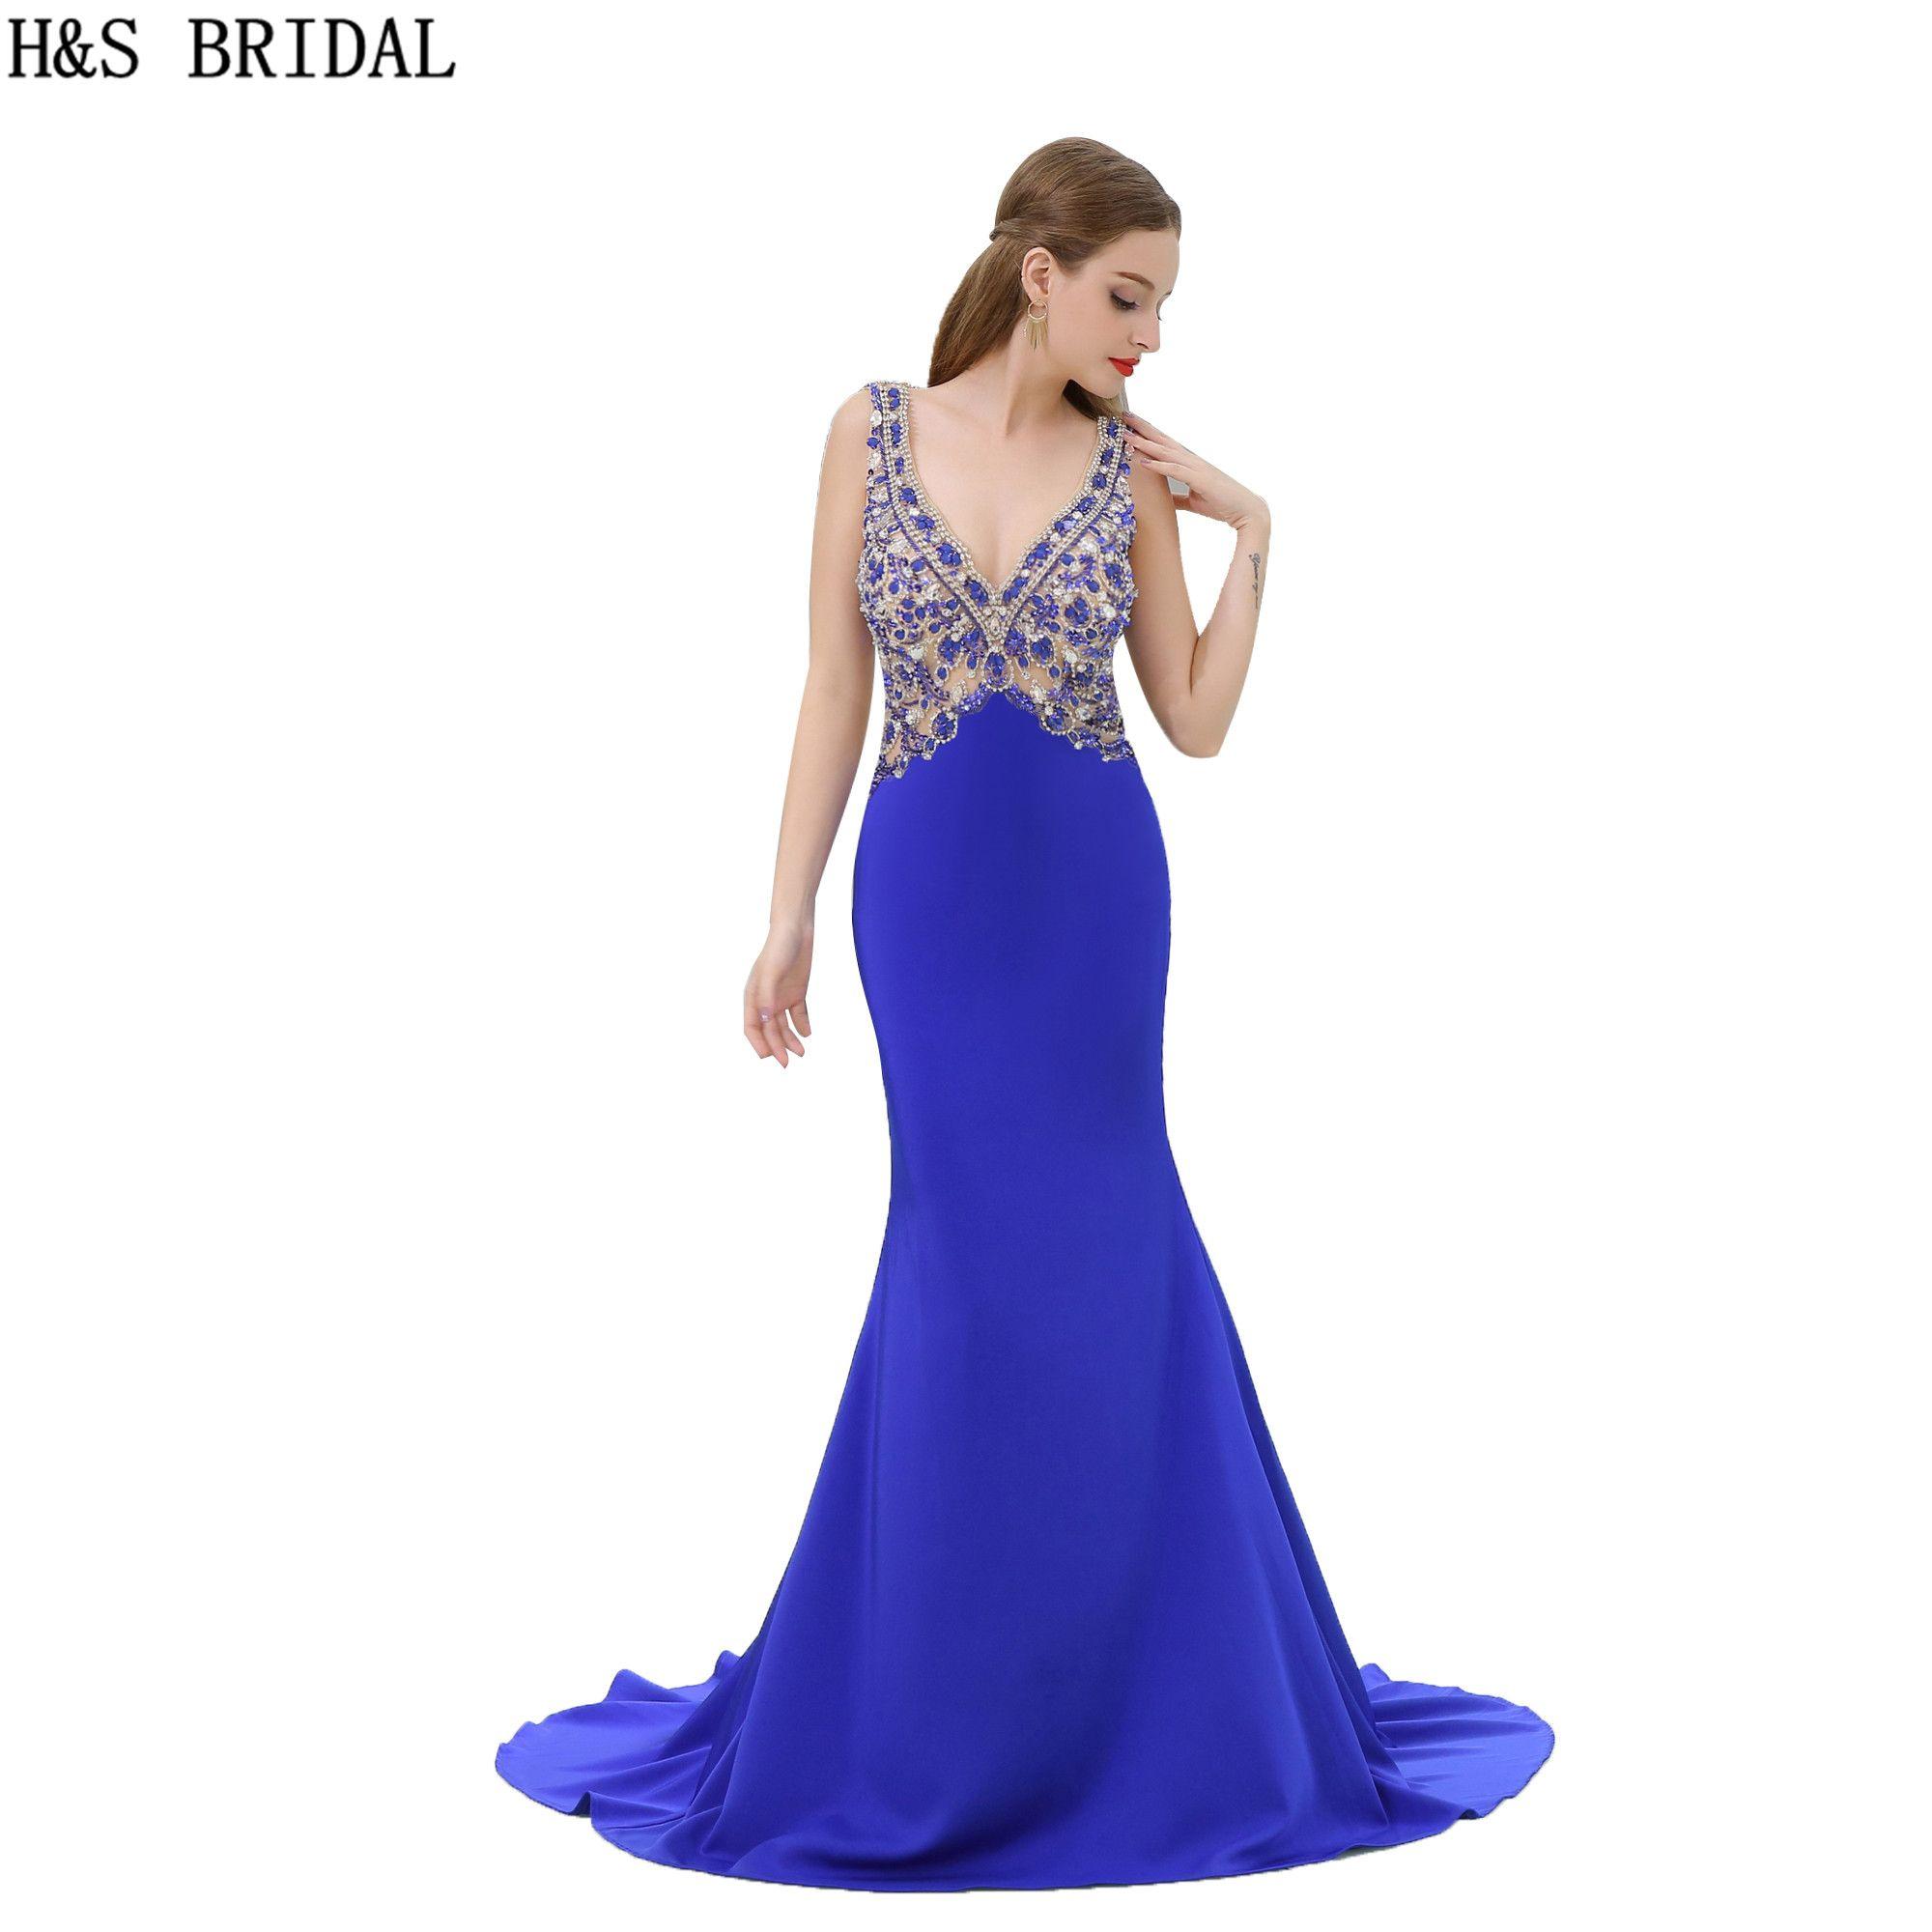 pretty nice 43a8b bae48 Sexy V Meerjungfrau Abendkleider Blau Illusion Perlen Lange 2017  Abendkleider Backless Party Prom Kleider B065